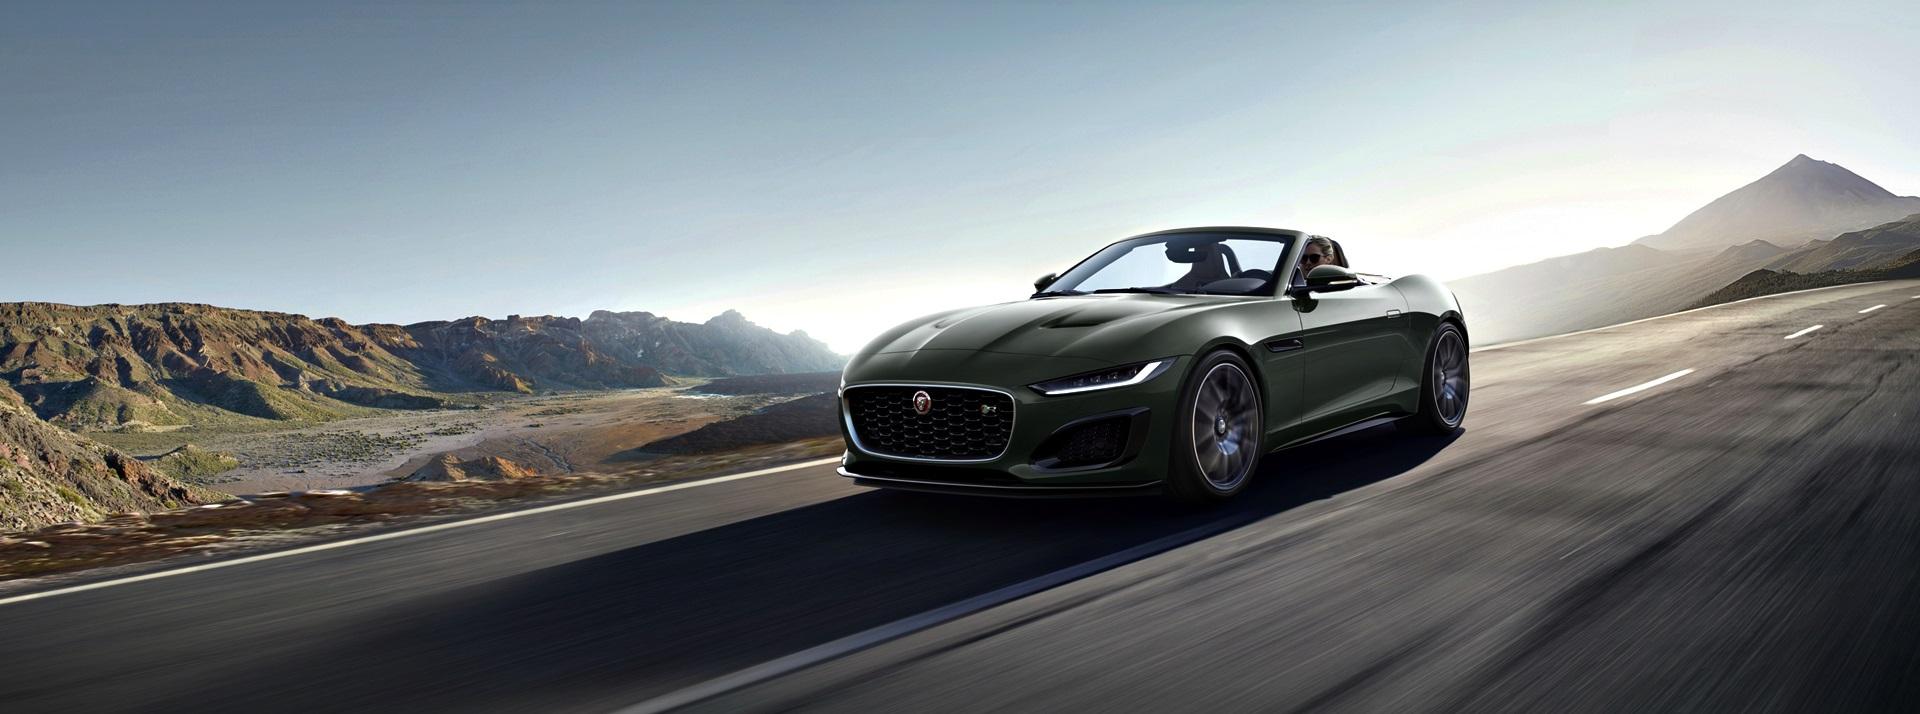 Jaguar F Type Heritage 60 Edition (2)